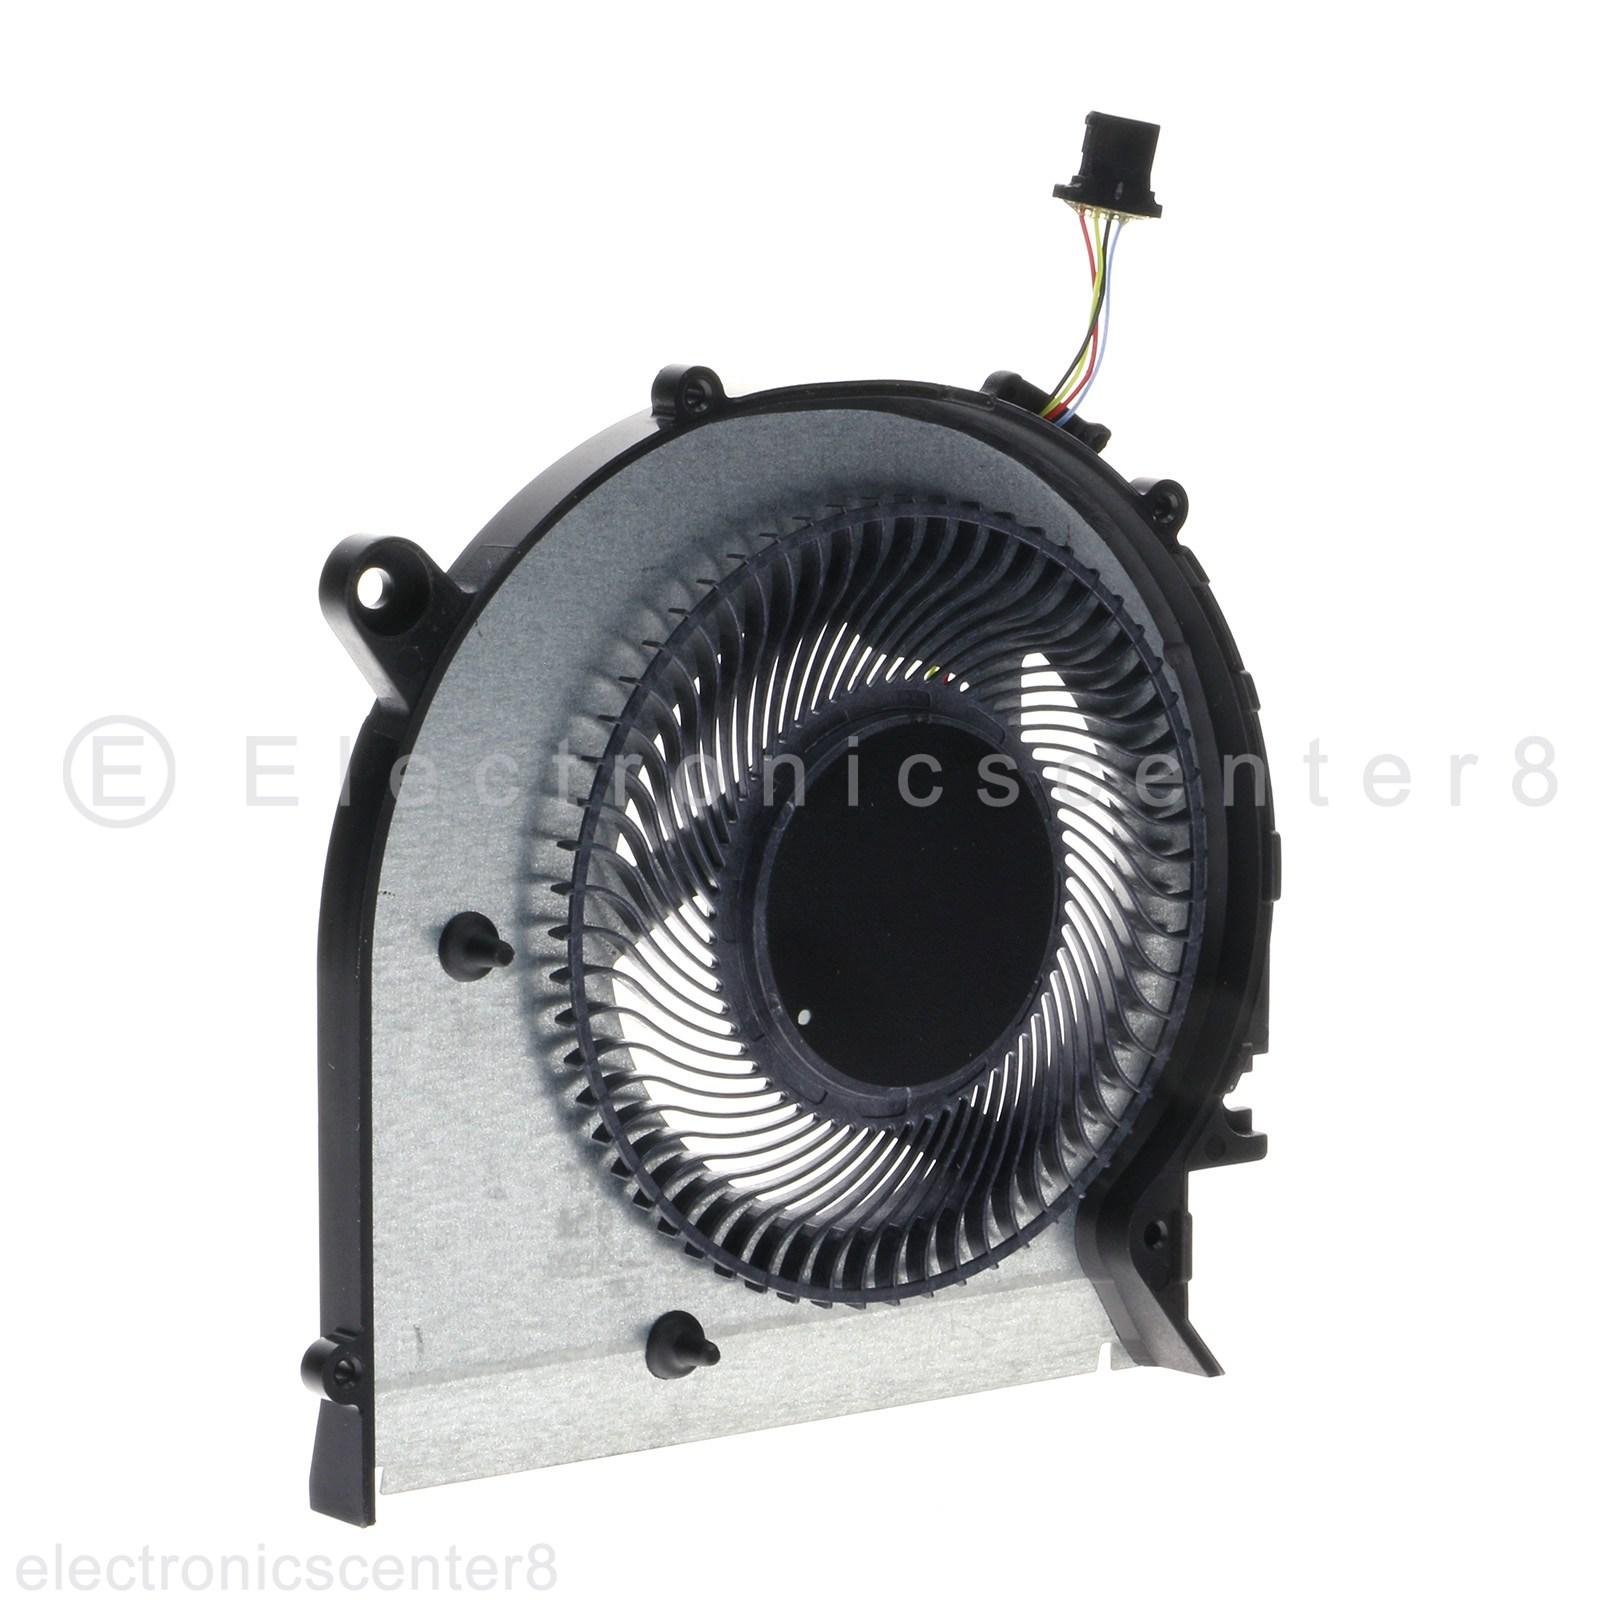 DBTLAP Laptop CPU Cooling Fan Compatible for HP Envy Notebook 13-d 13T-D 15-ay Series 829296-001 DC28000GWS0 EG50040S1-C620-S